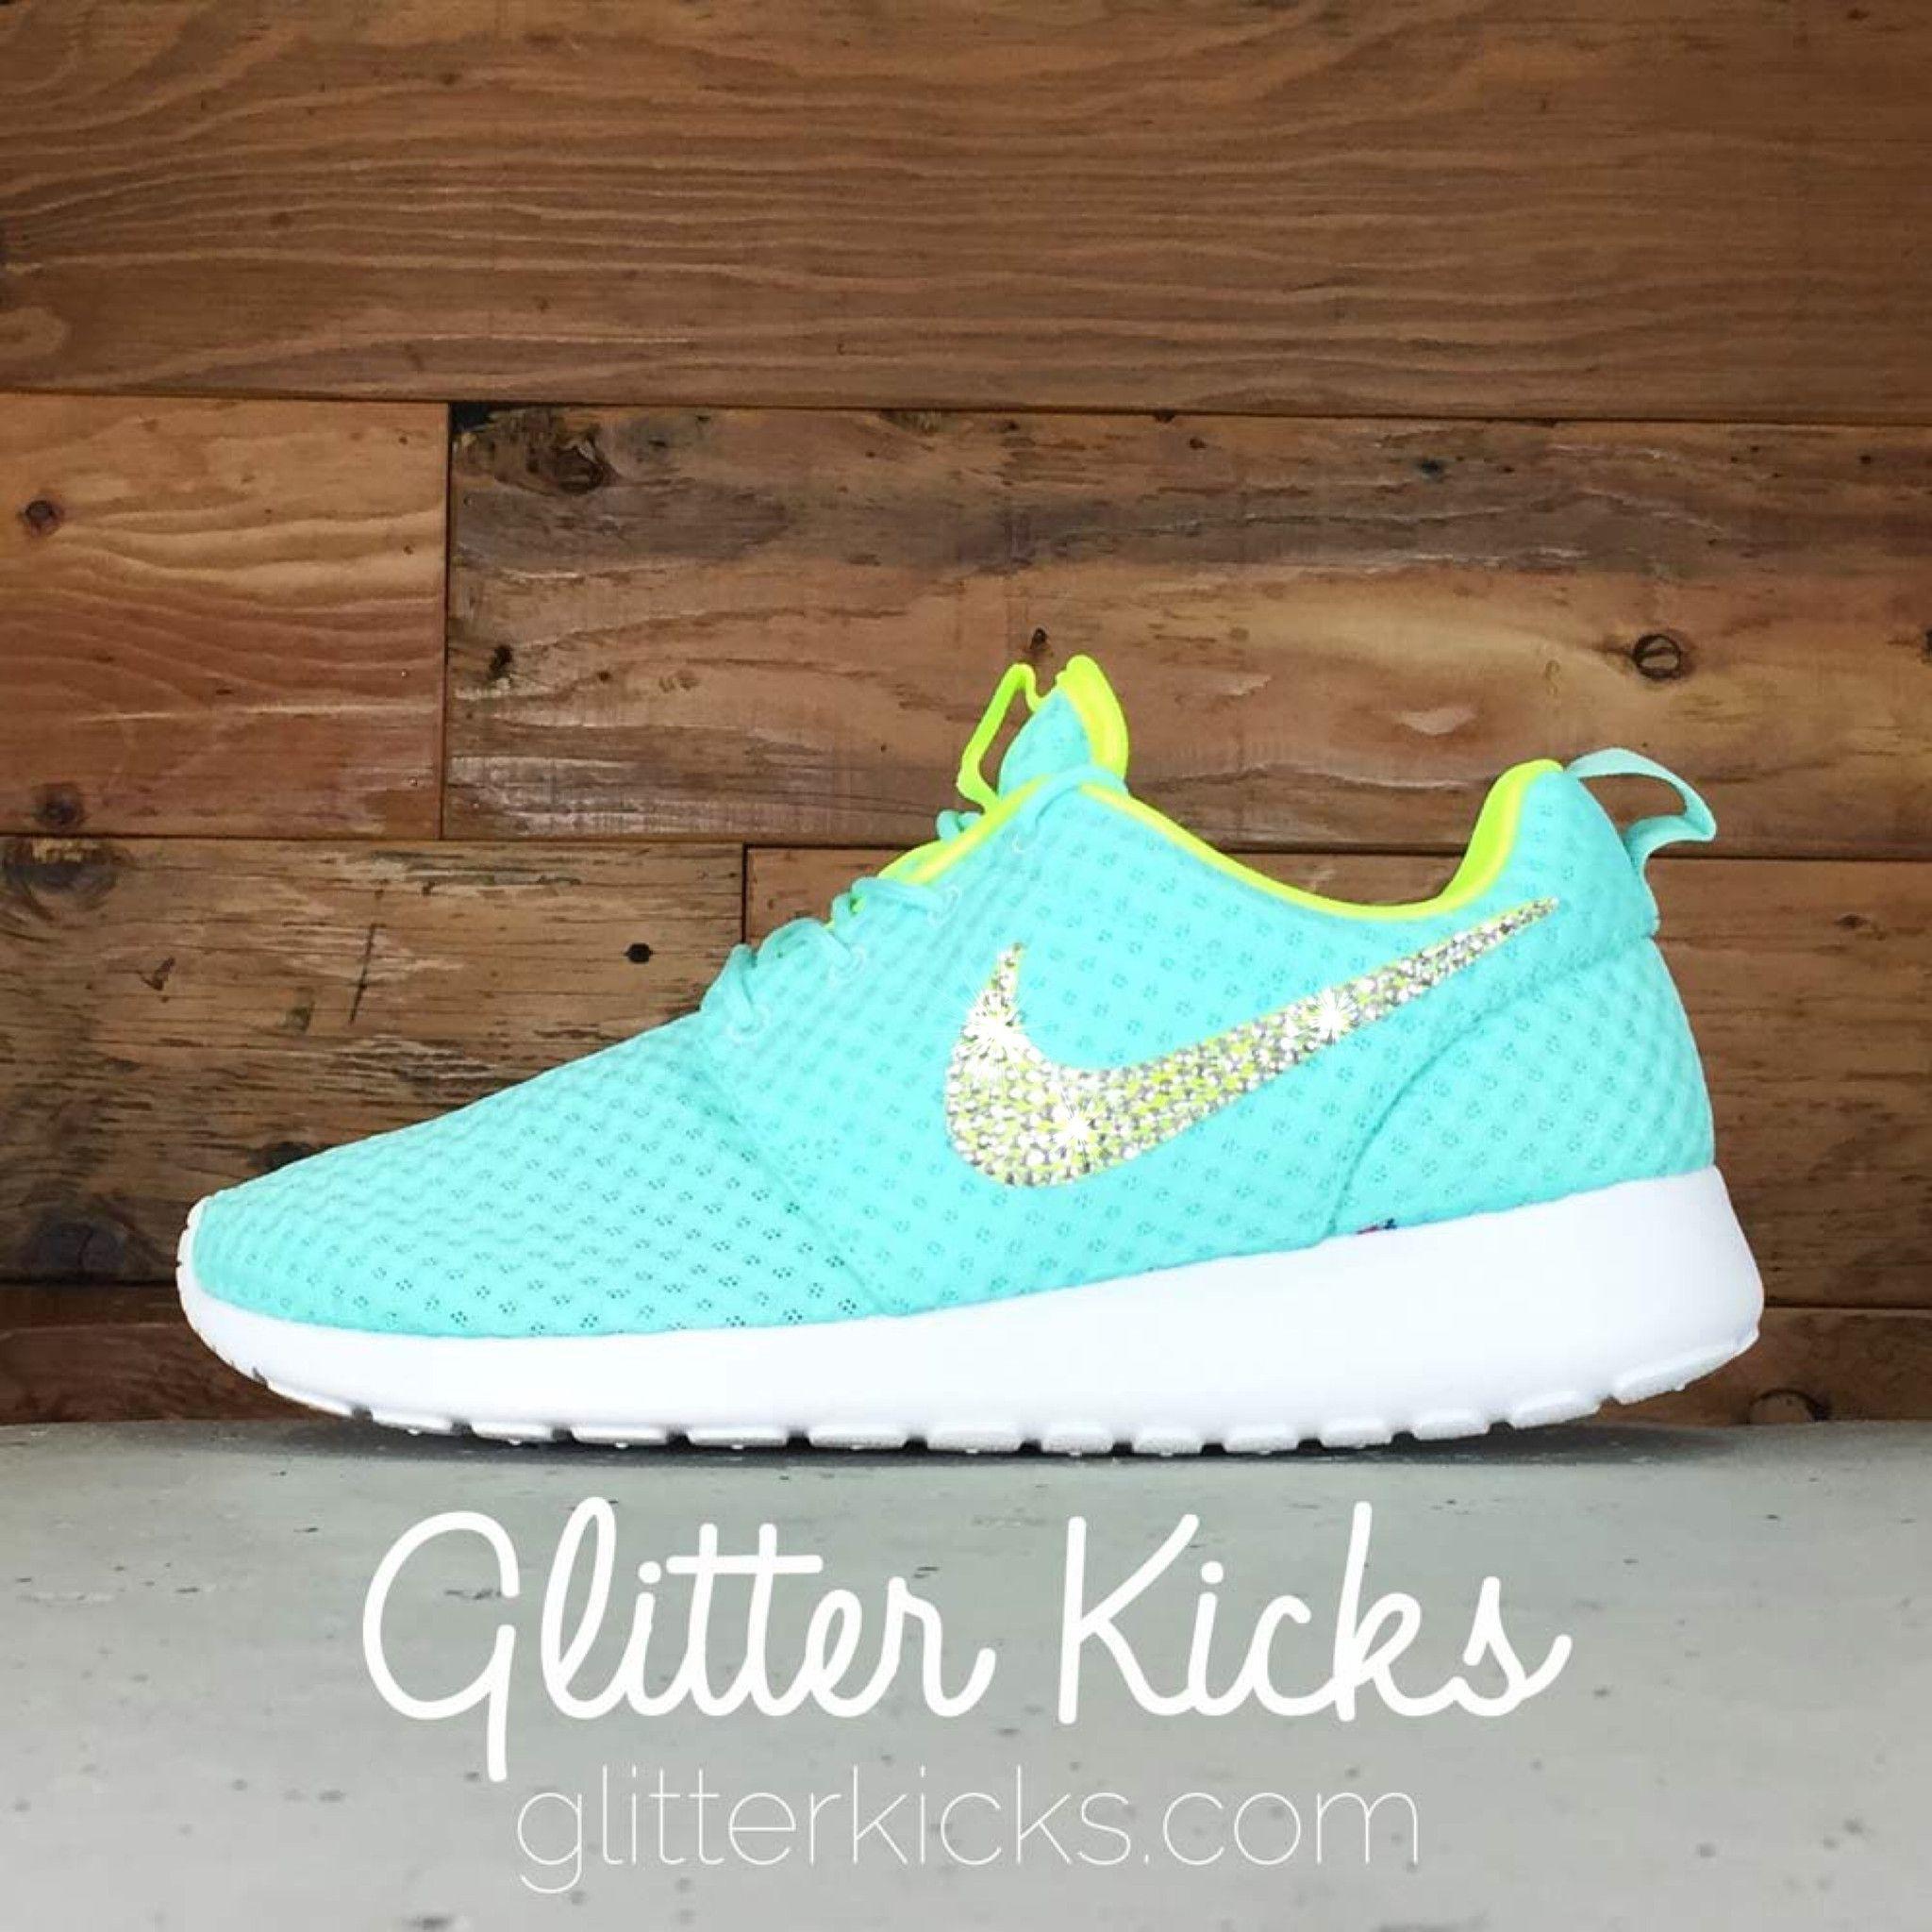 biggest discount 5dcb7 28ee5 buy nike womens shoes online glitterkick  pinterest.com 9906f69e4d23